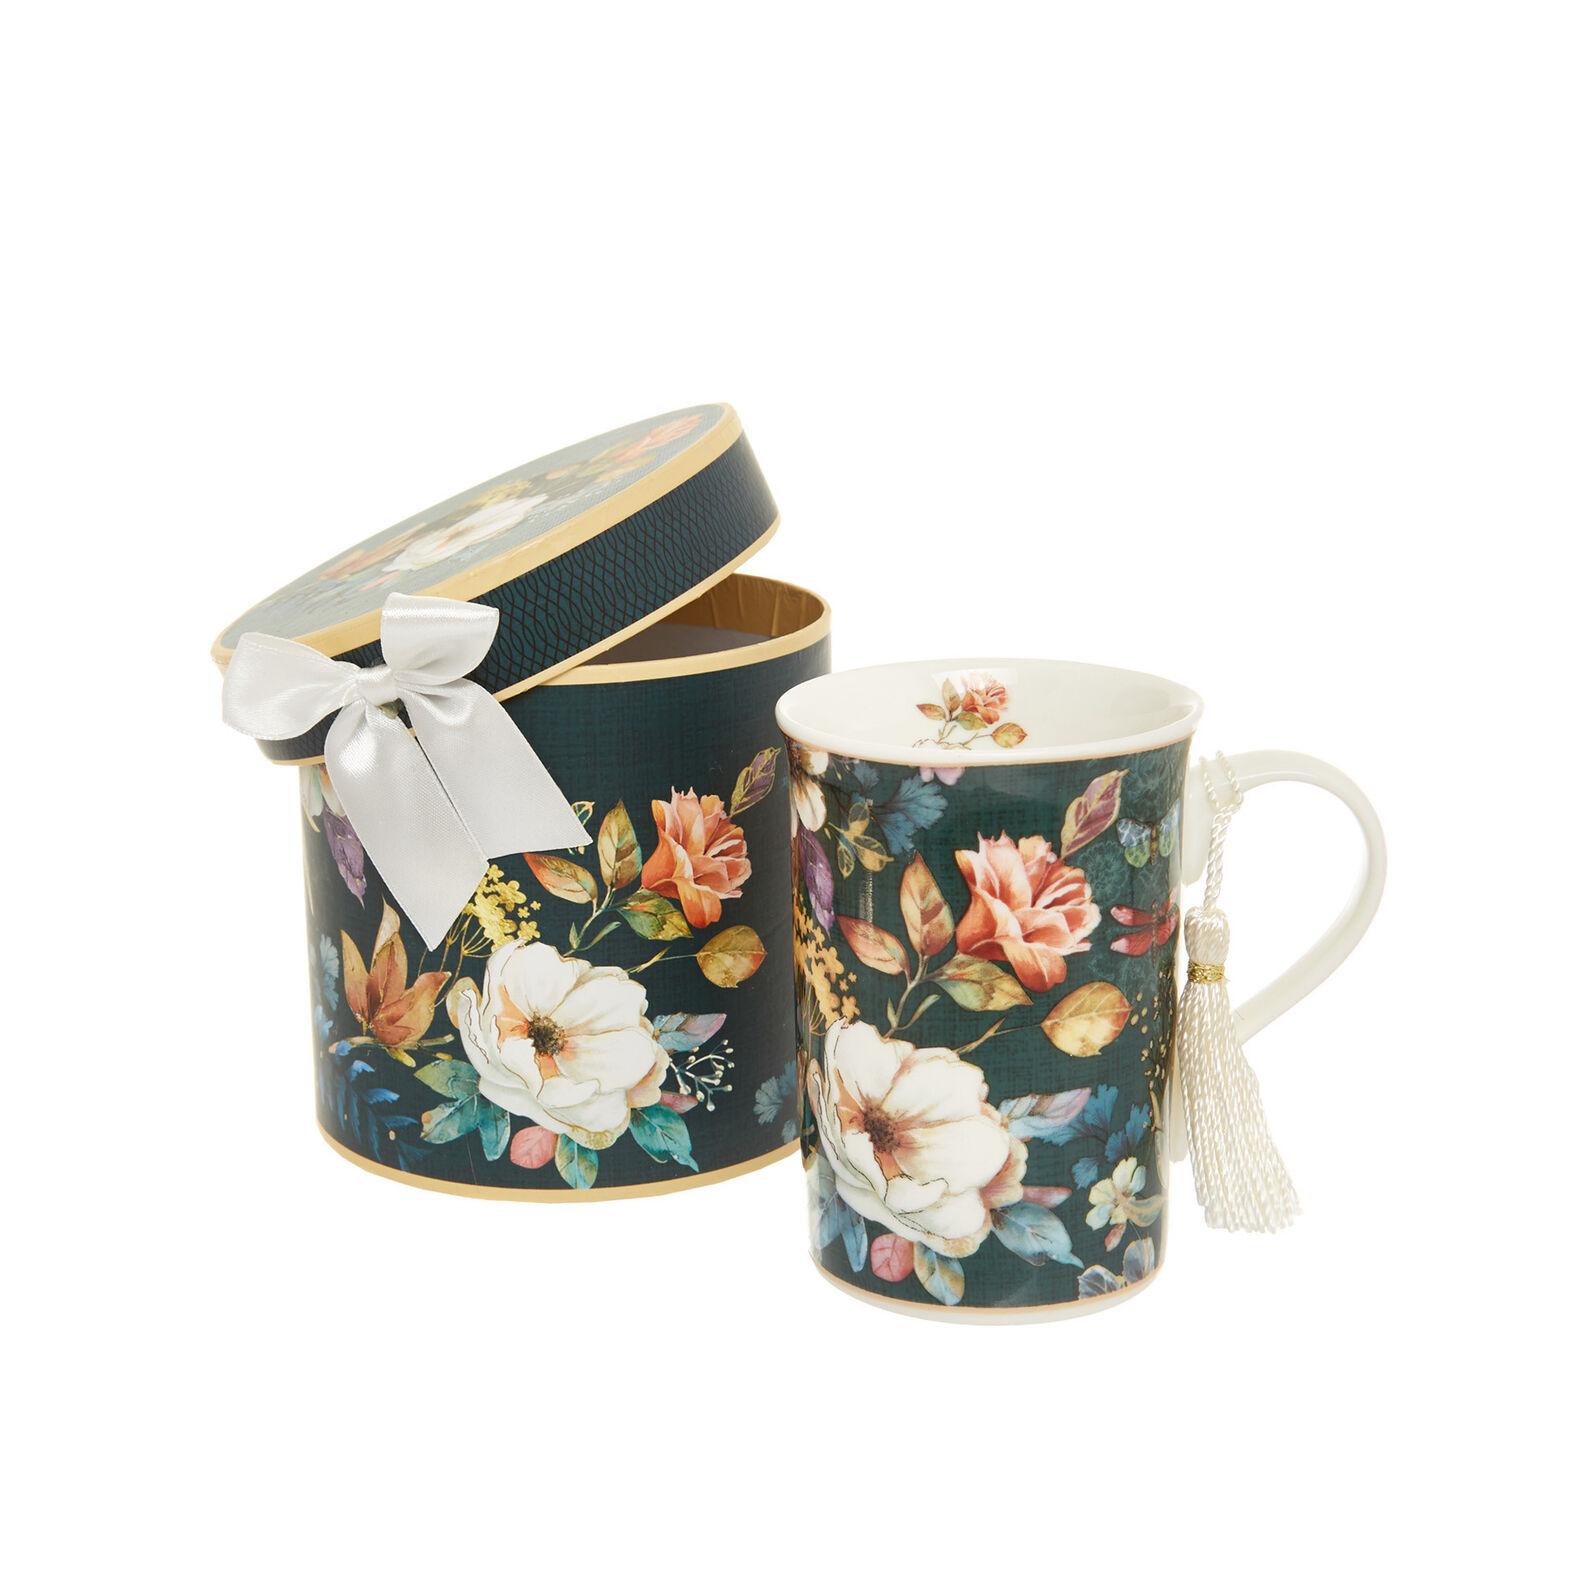 Mug in new bone China with floral motif